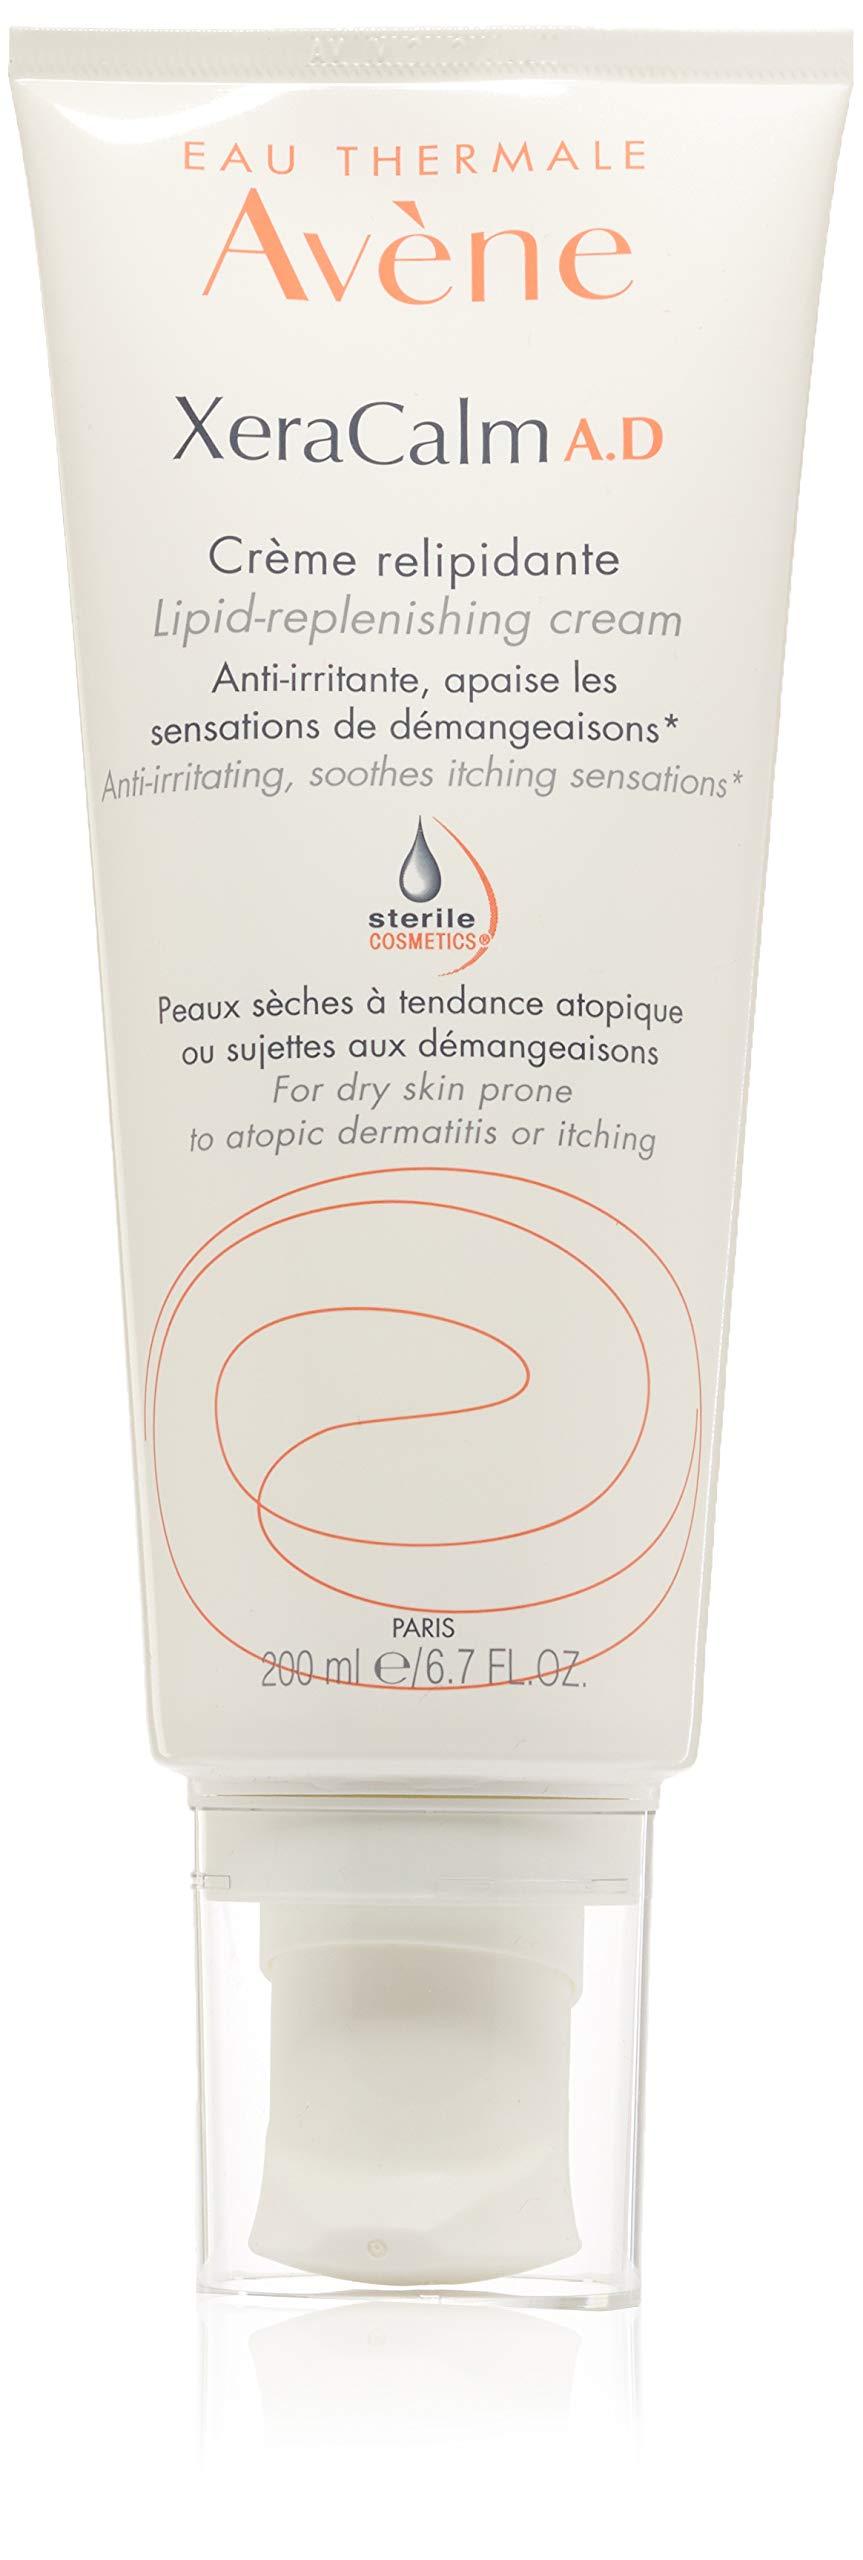 Avène – Crema Relipidante XeraCalm A.D Avène 200 ml